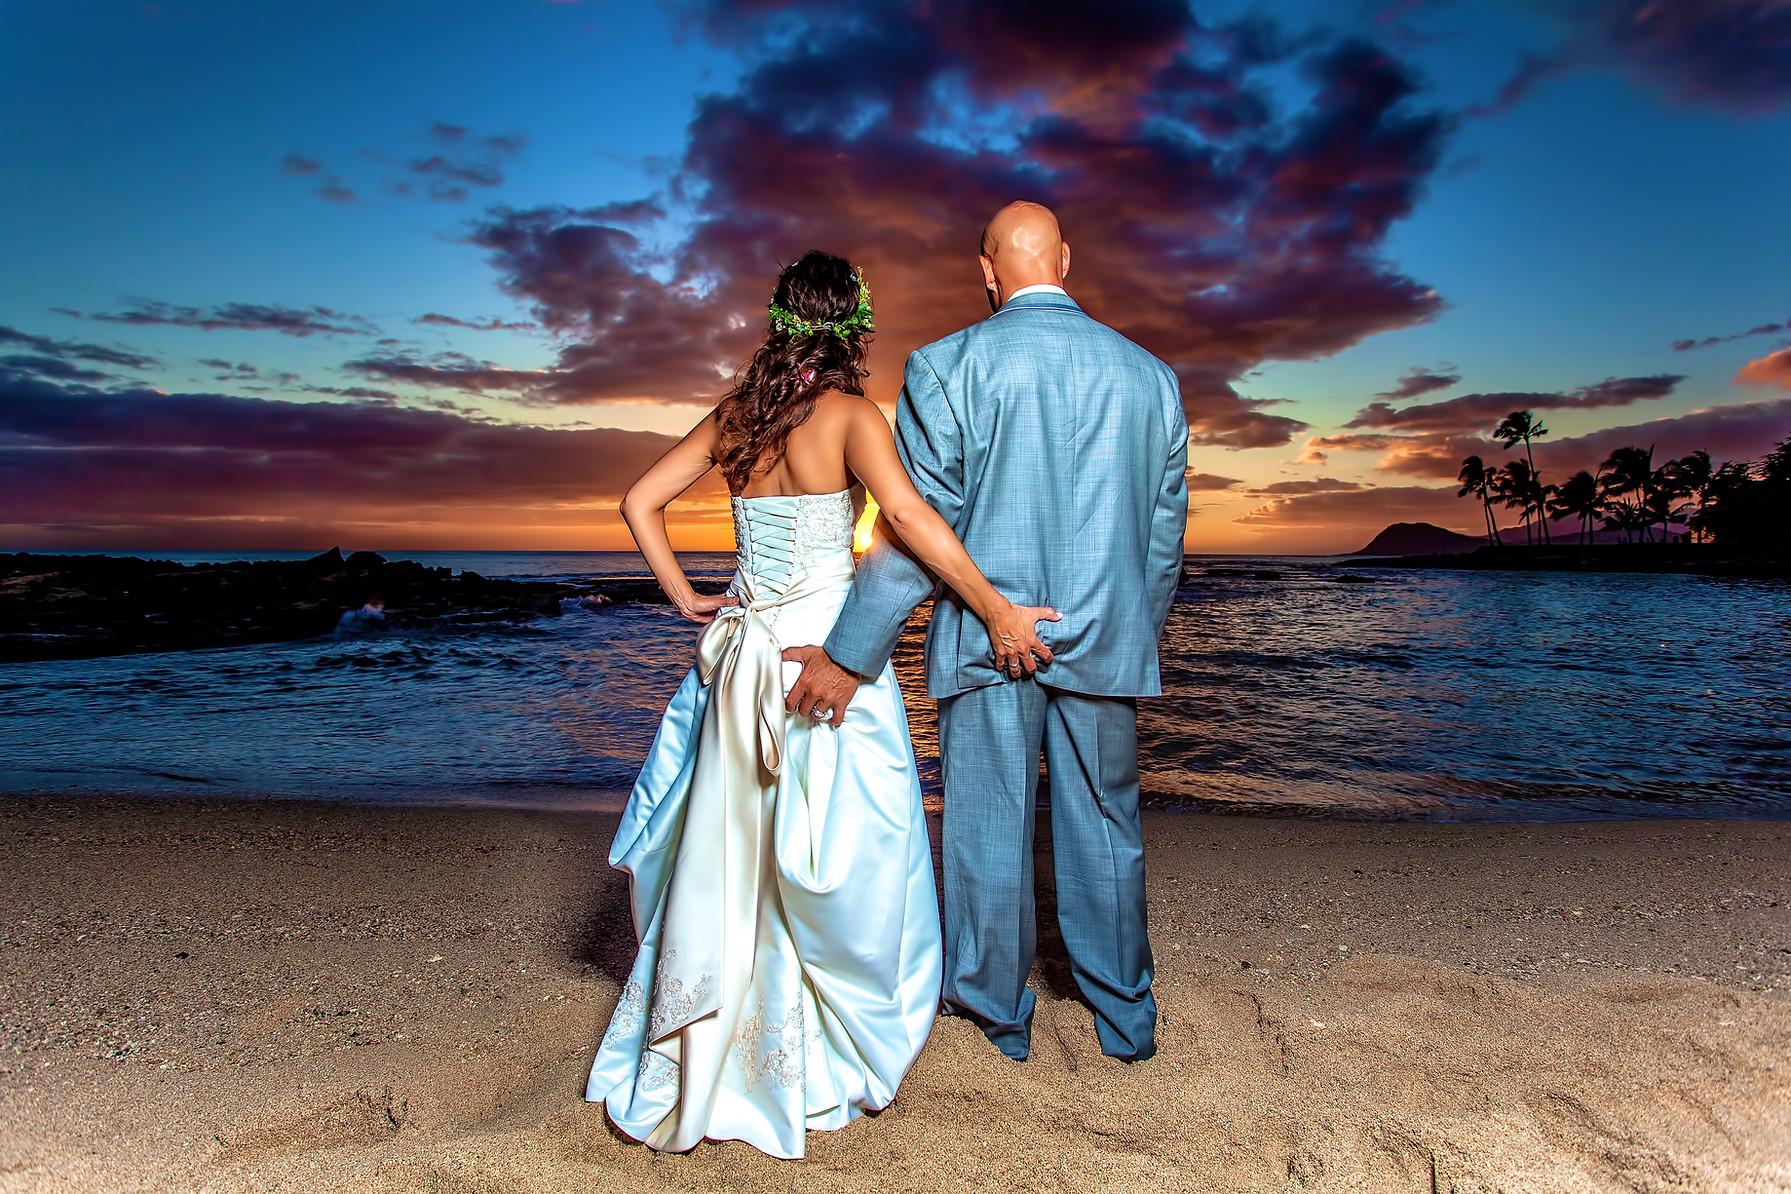 Sunset Photo at Koolina Hawaii